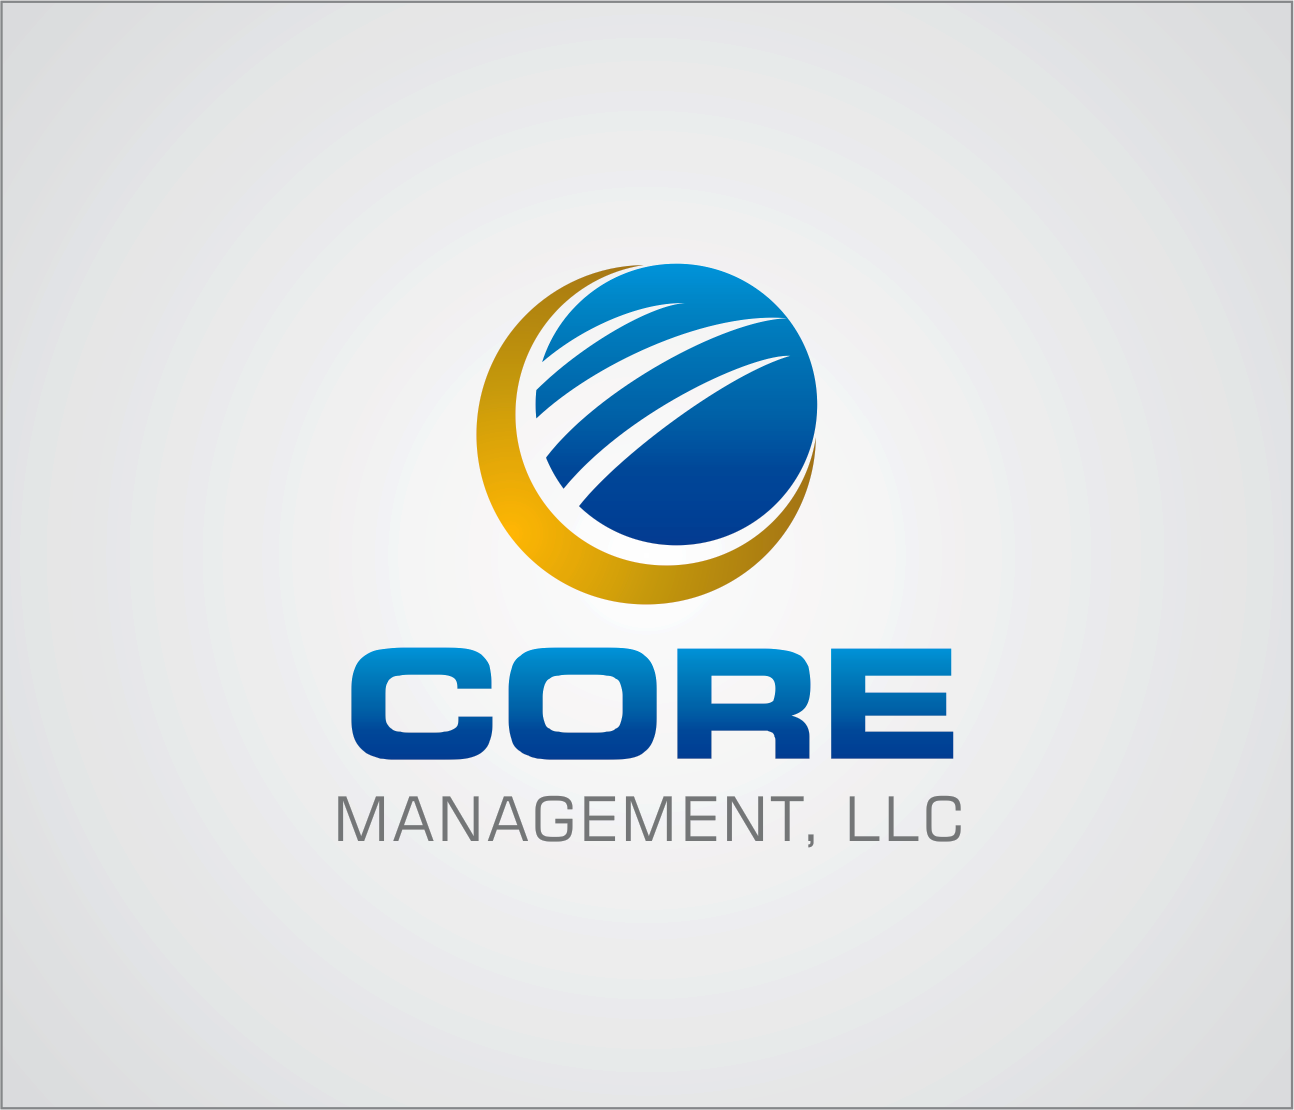 Logo Design by Armada Jamaluddin - Entry No. 202 in the Logo Design Contest Creative Logo Design for CORE Management, LLC.